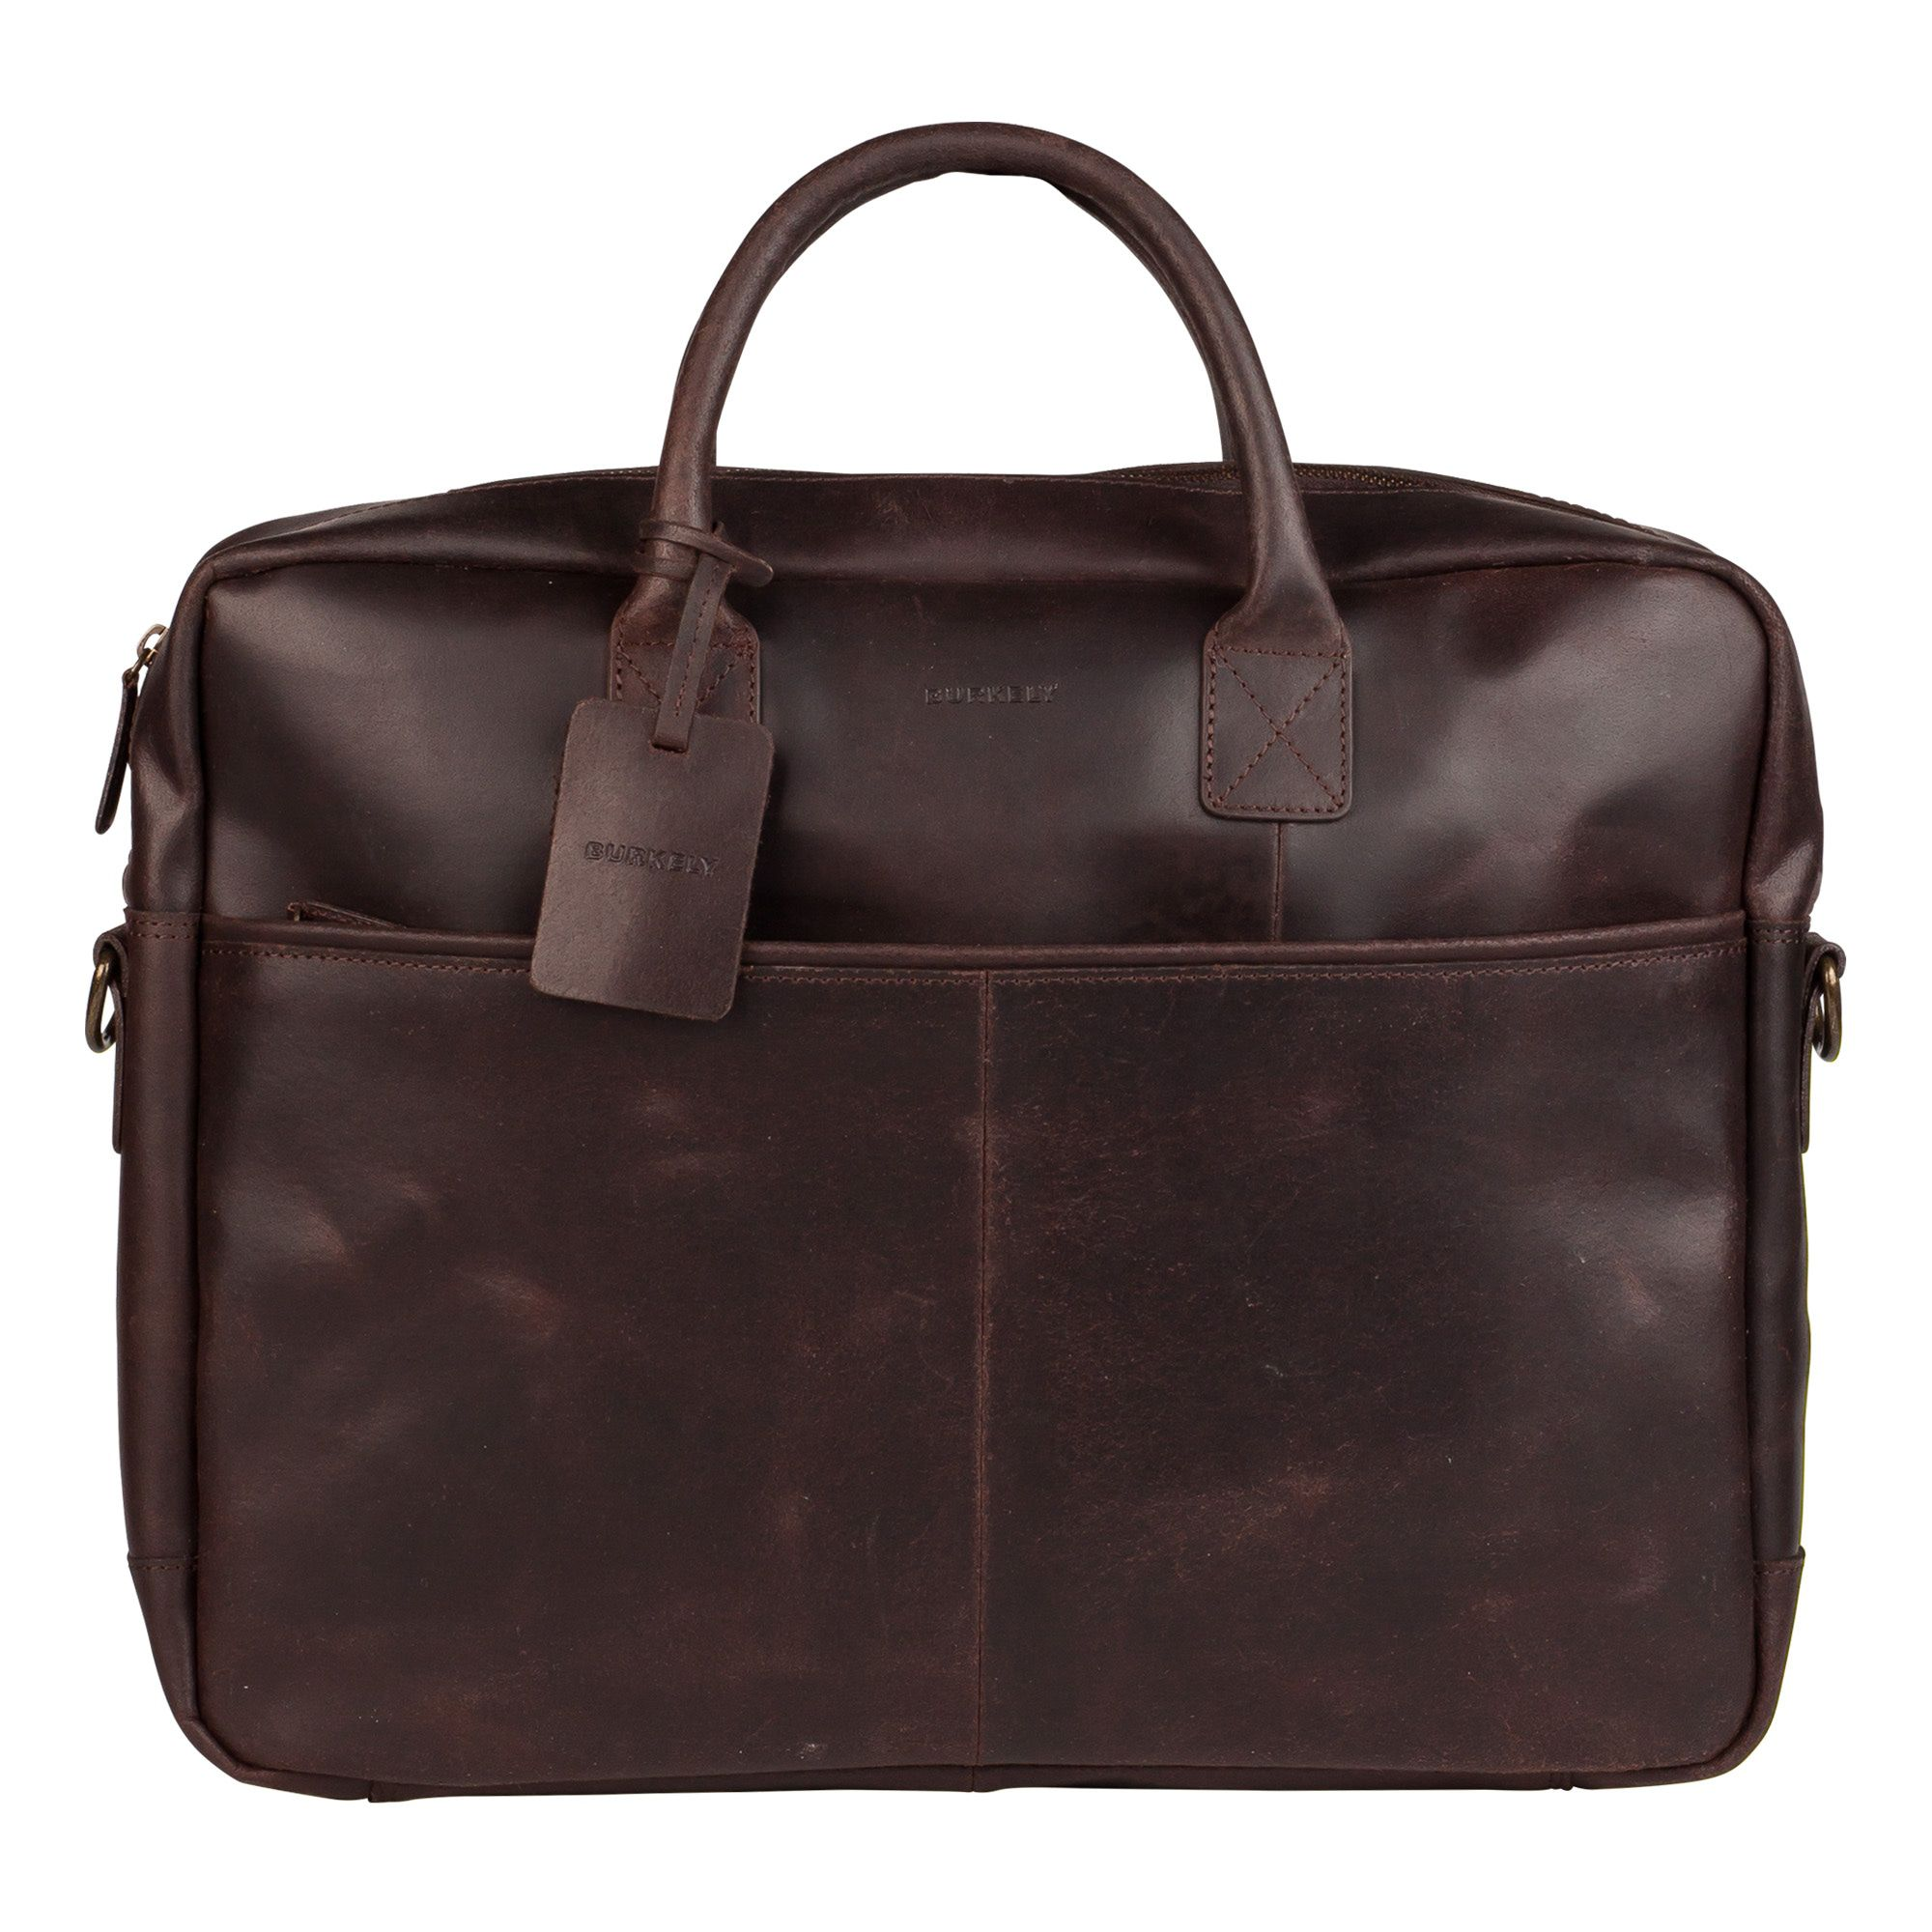 Laptoptas Burkely Max Vintage Business Shoulderbag Dark Brown 17 inch